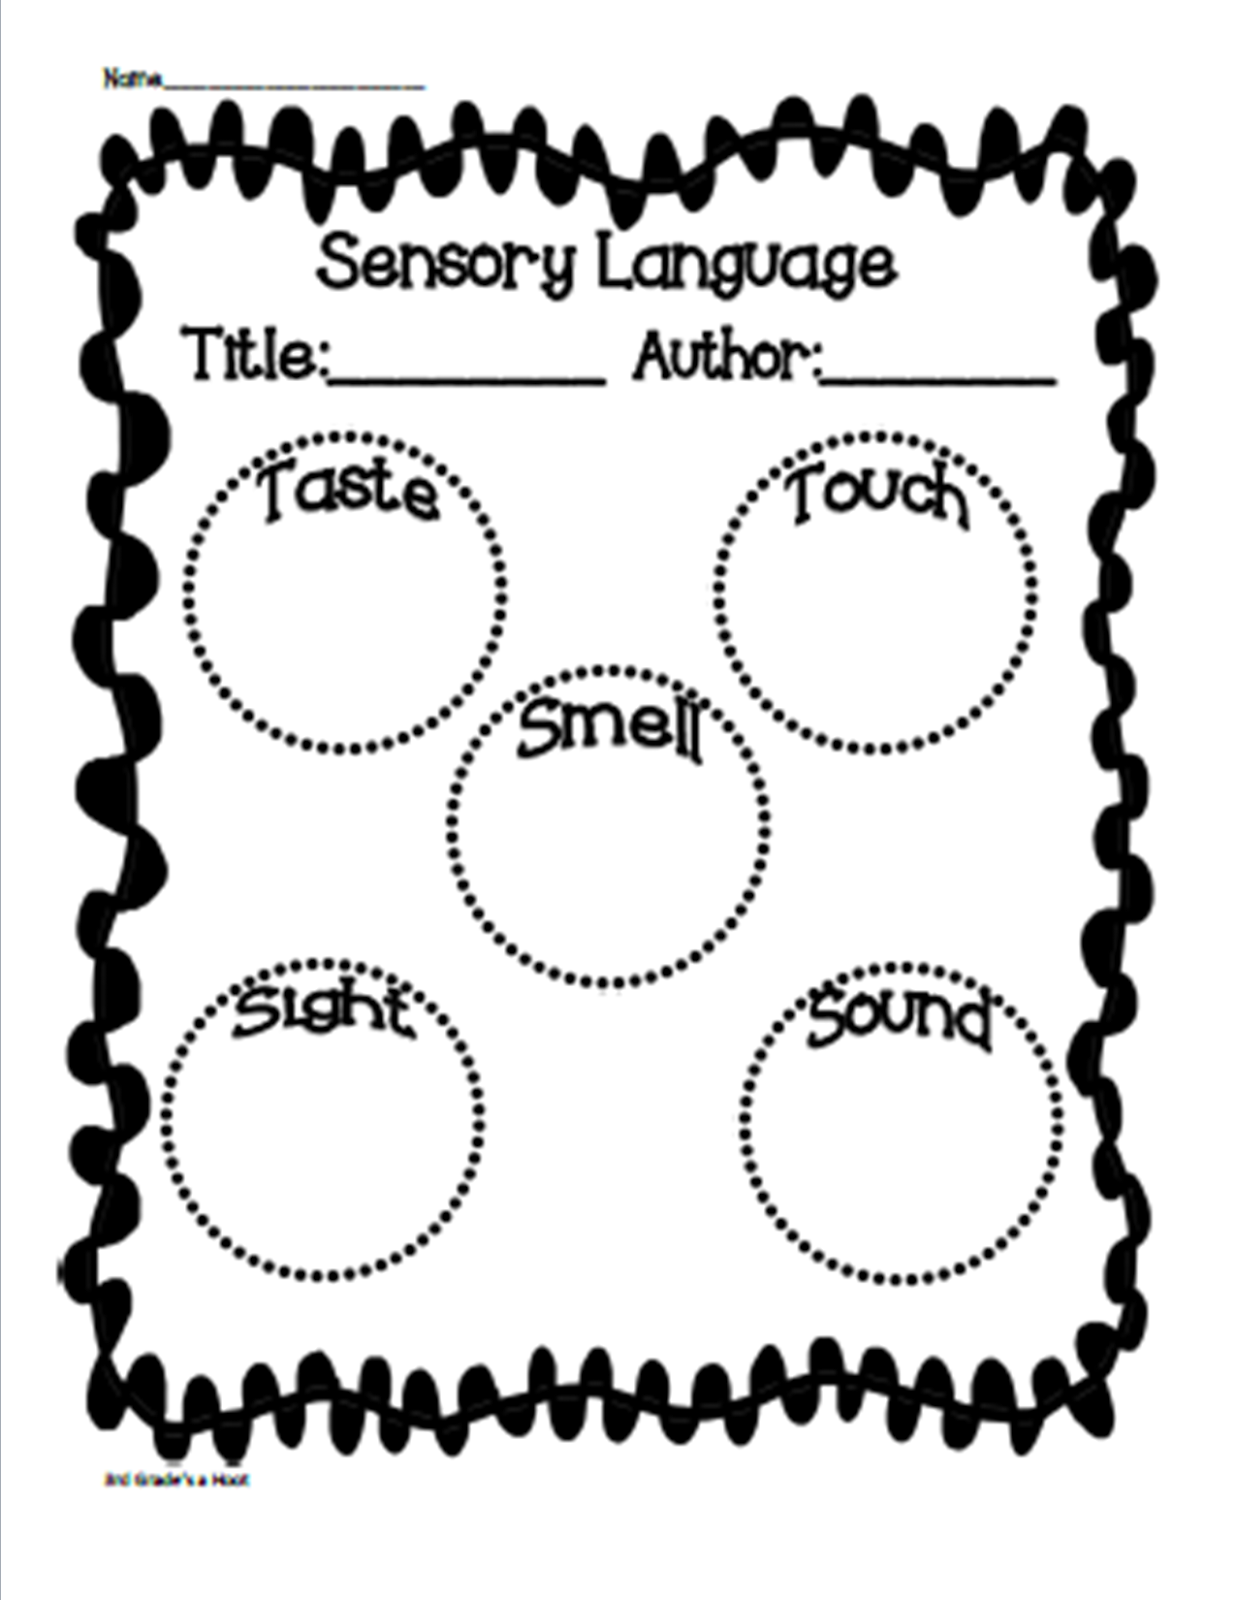 Sensory Language Freebie 3rd Grades A Hoot Creative Classroom